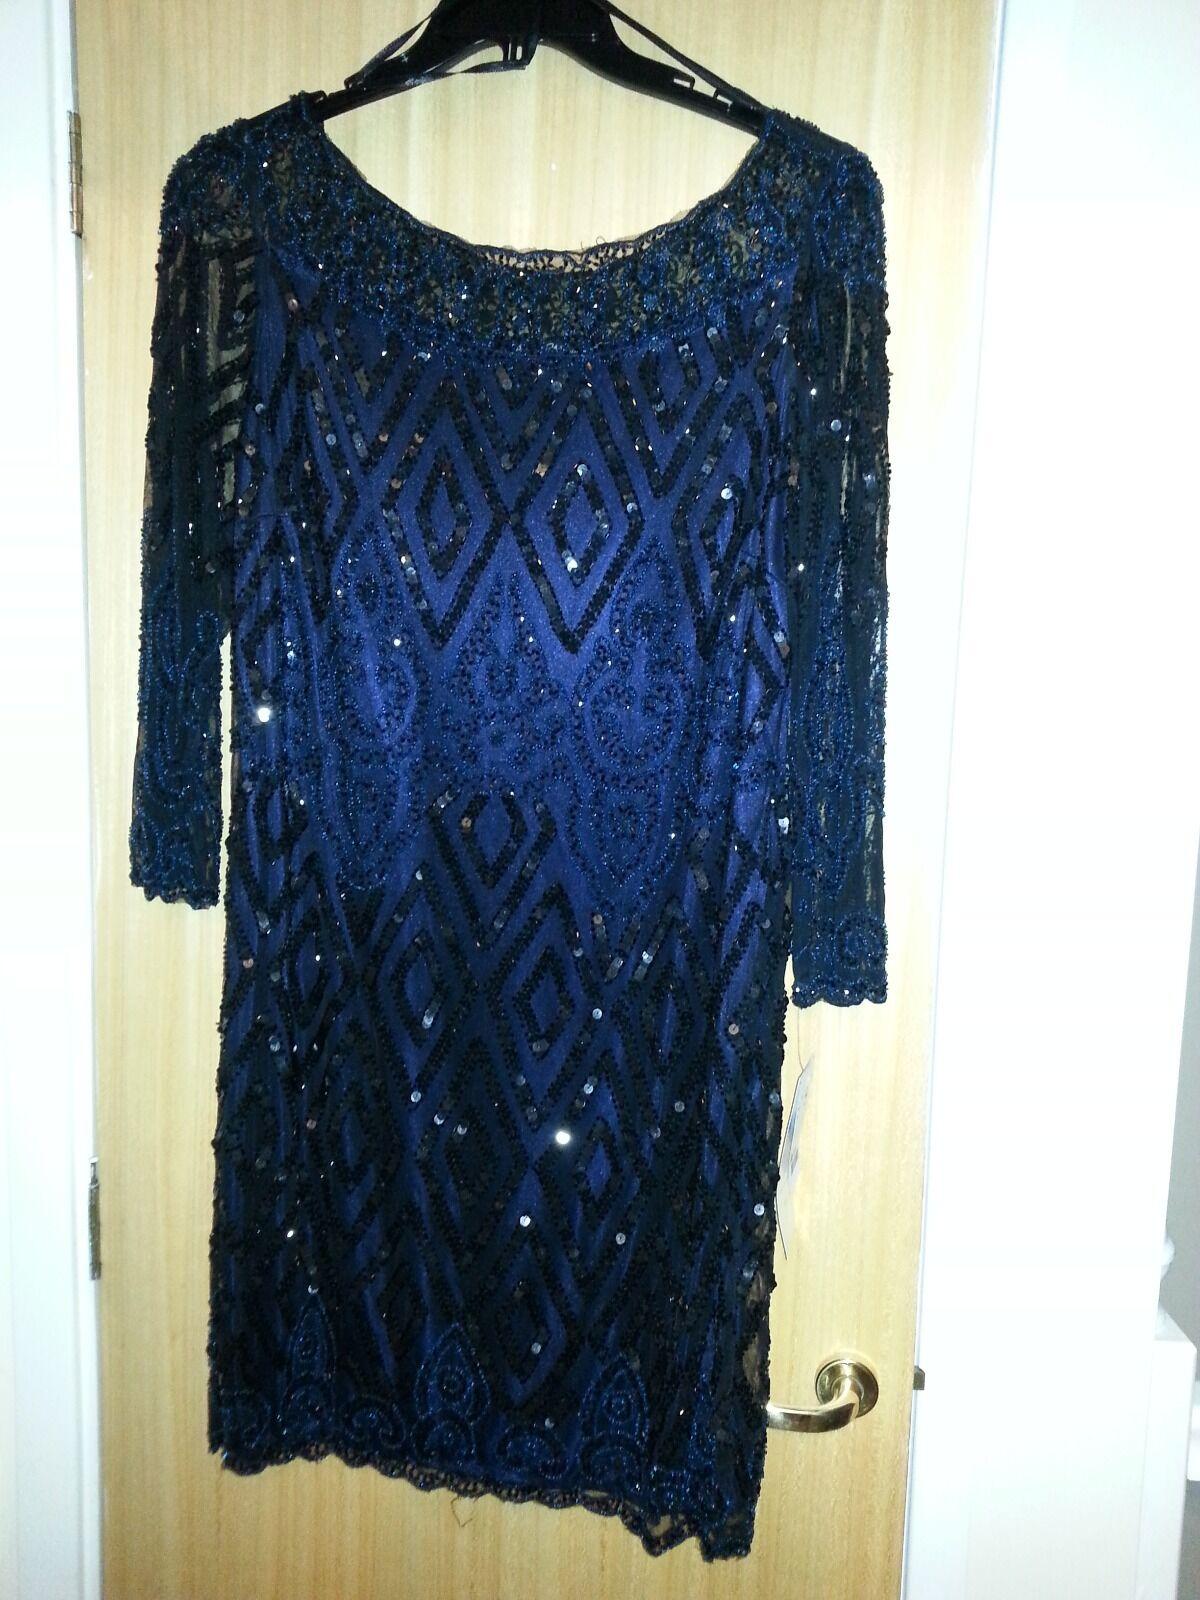 TK Maxx Ladies Sequin Dress Größe 16 BNWT